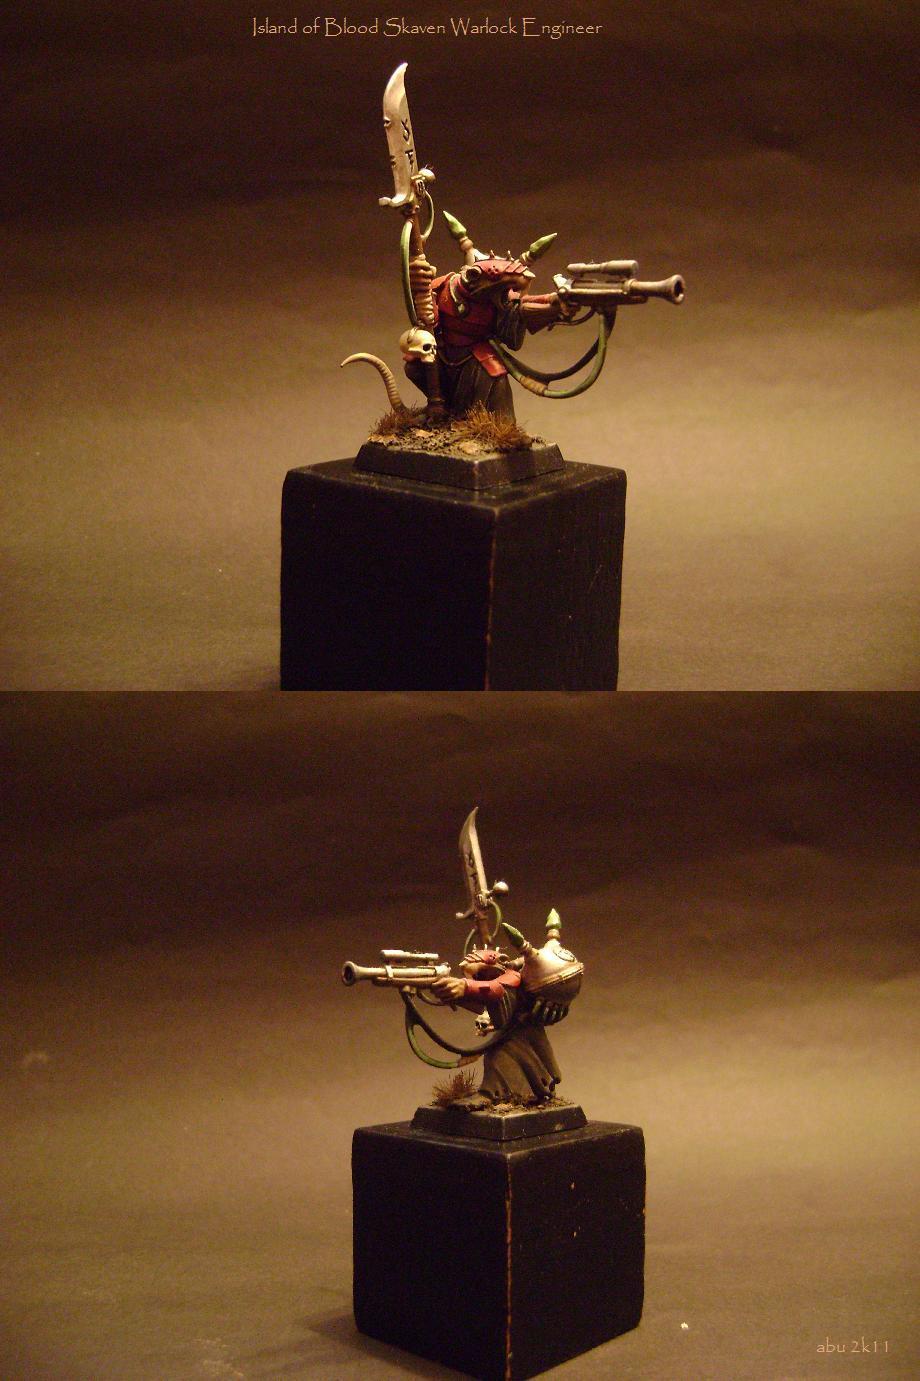 Skaven, Warhammer Fantasy, Warlock Engineer